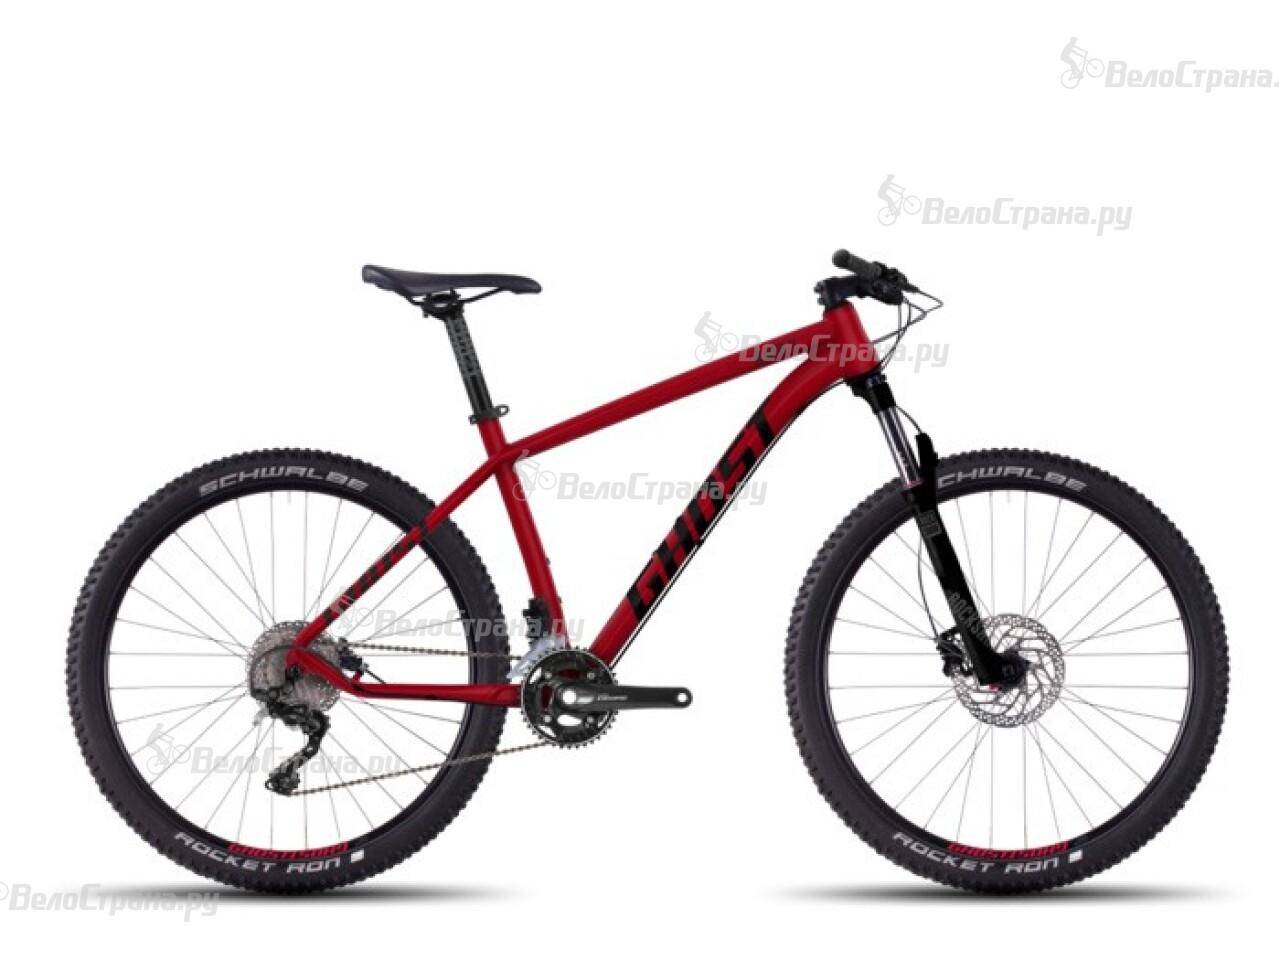 Велосипед Ghost Kato X 6 (2016) цены онлайн